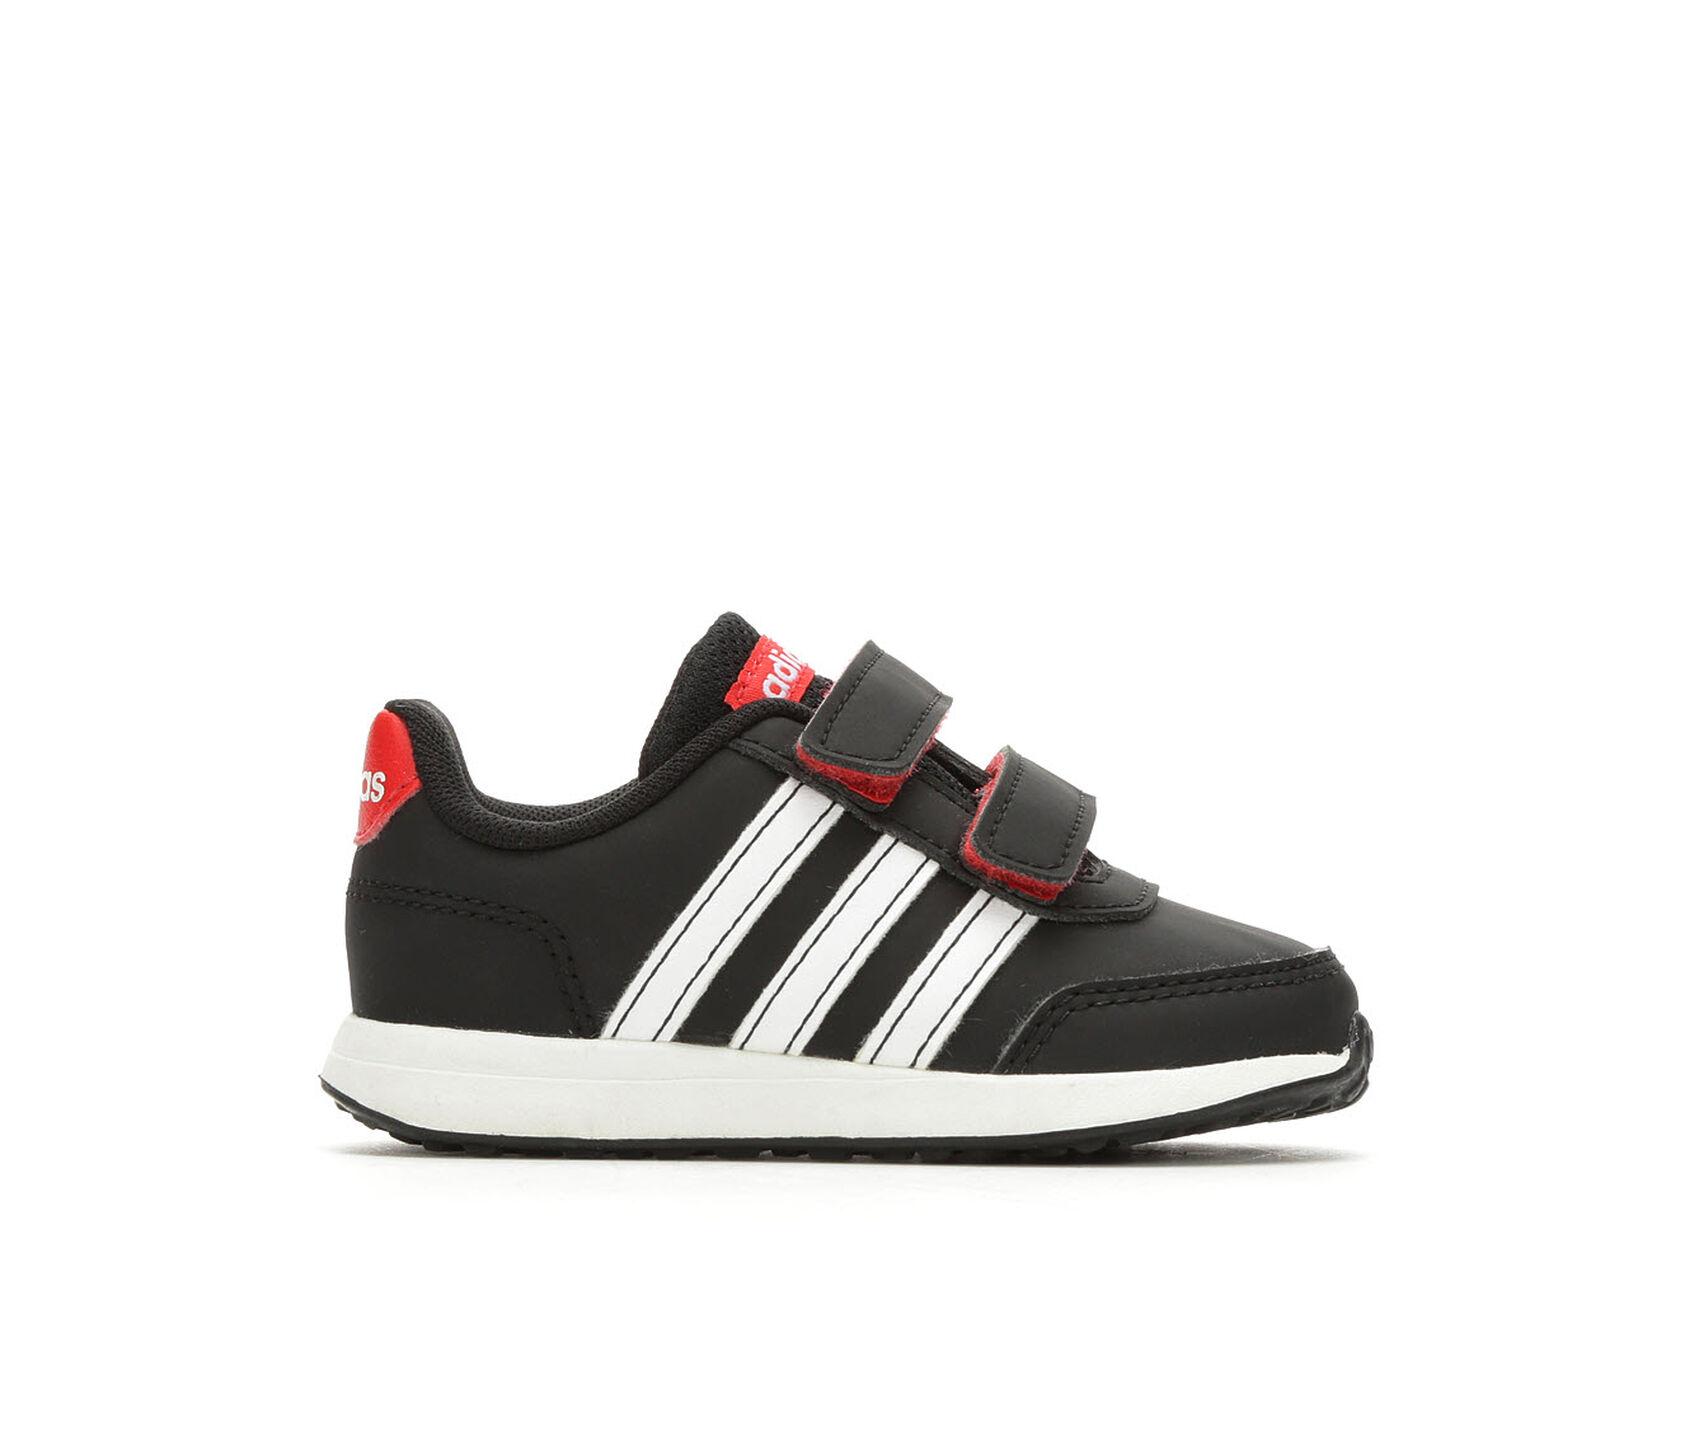 Boys  Adidas Infant   Toddler VS Switch Athletic Shoes  b4440b8ae